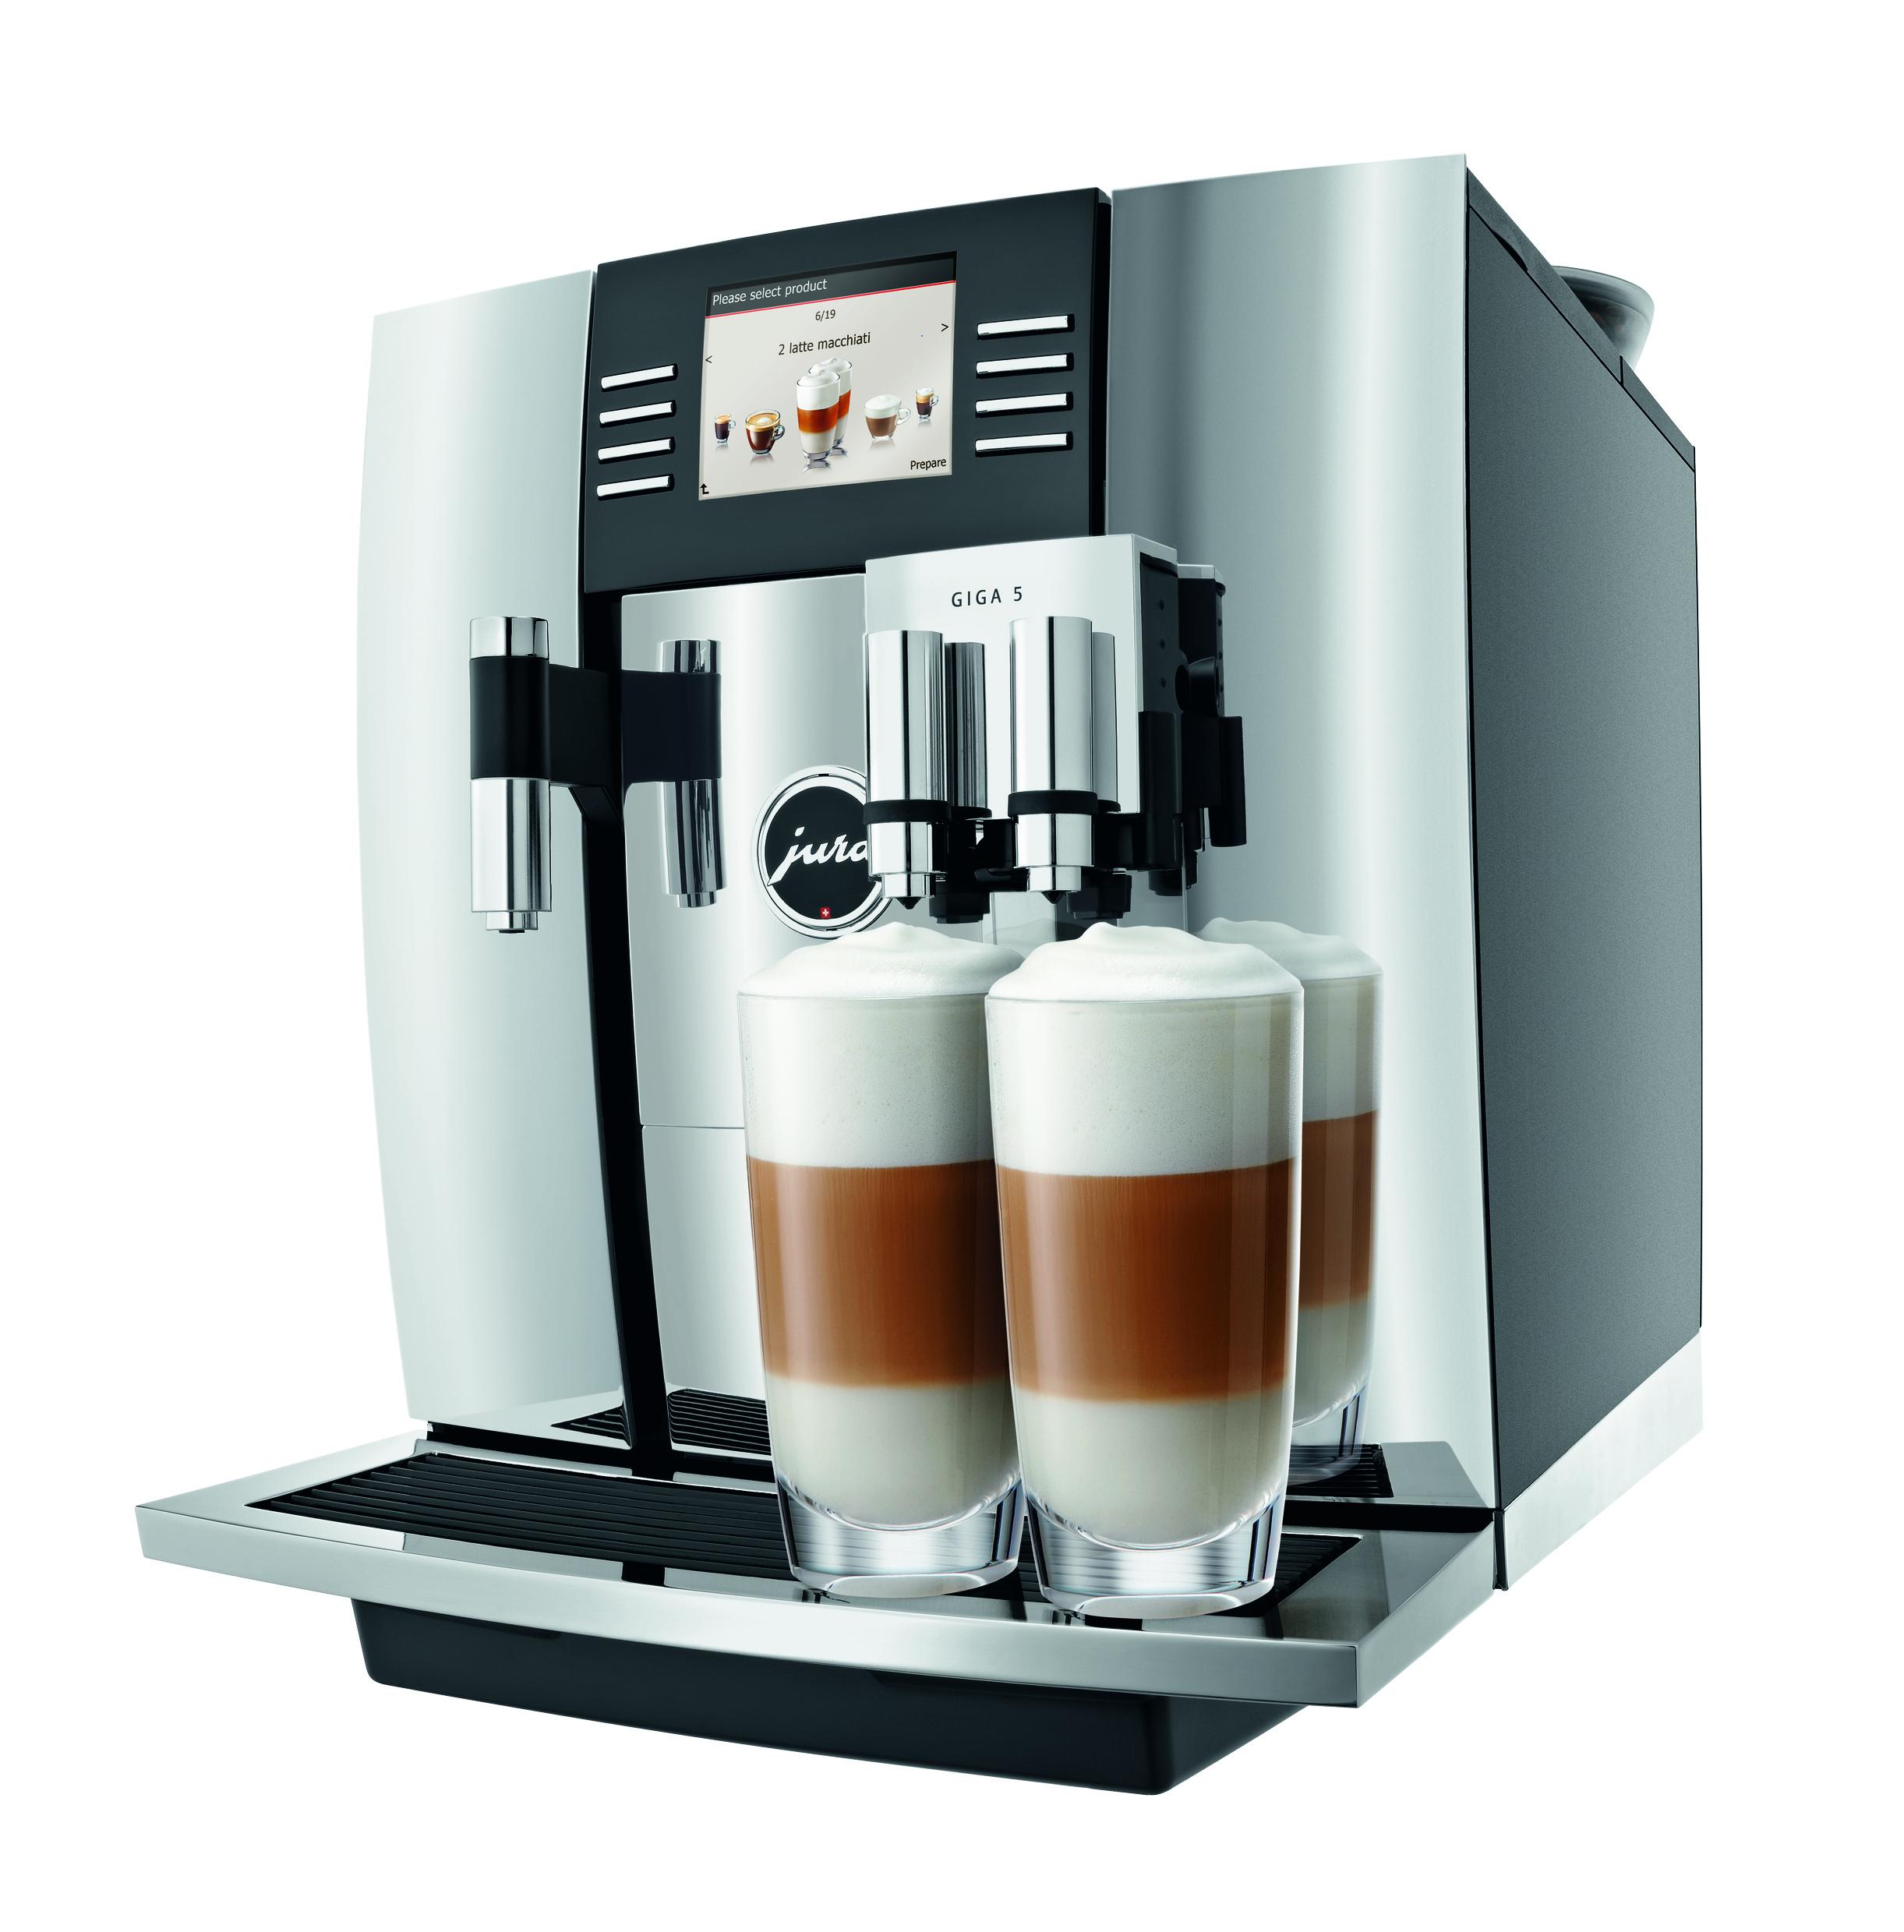 5 Cup Coffee Maker Giga 5 Jura Jura Coffee Maker 1st In Coffee